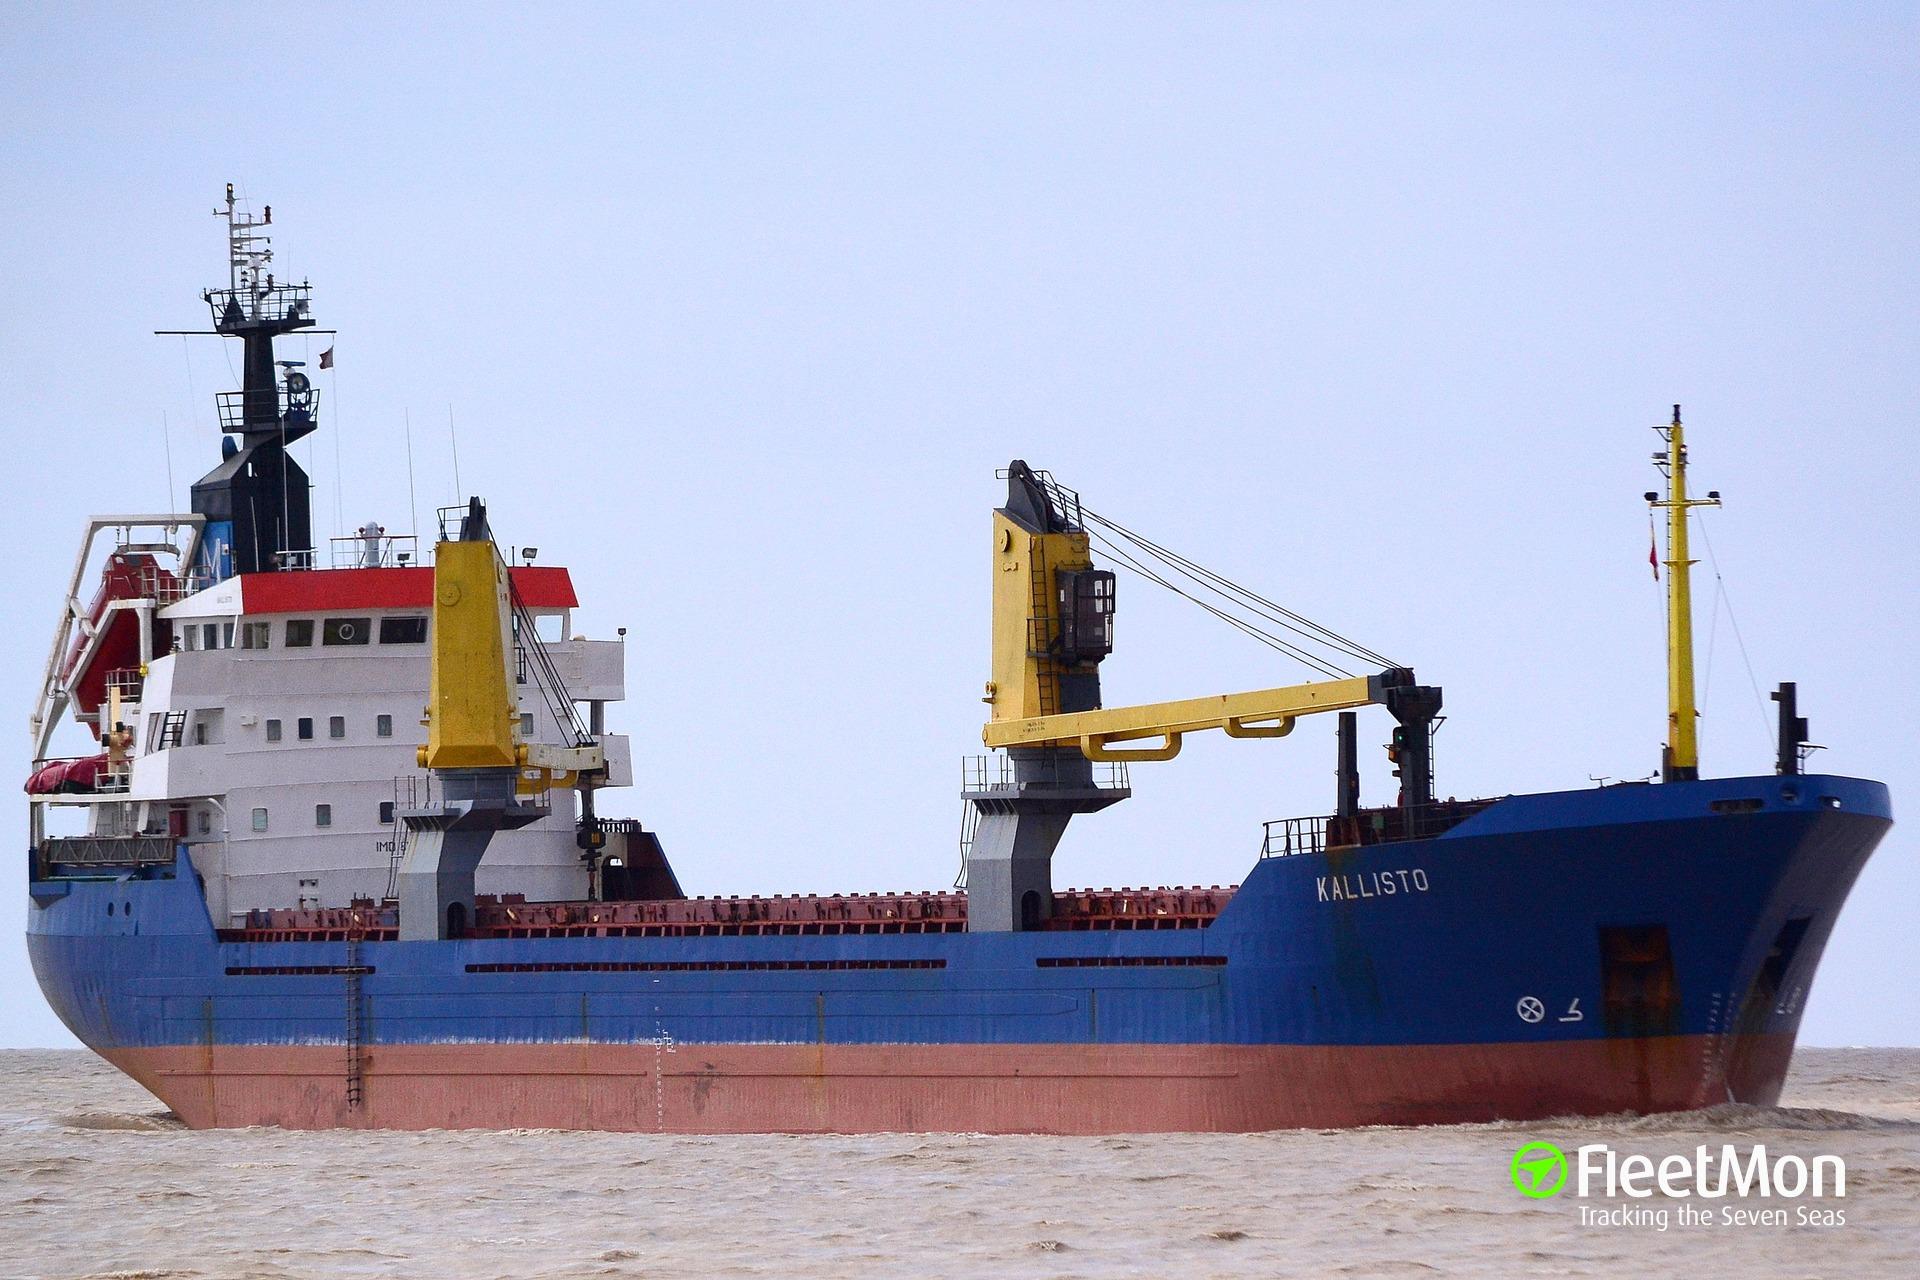 Two Ukrainian freighters in trouble in Marmara sea